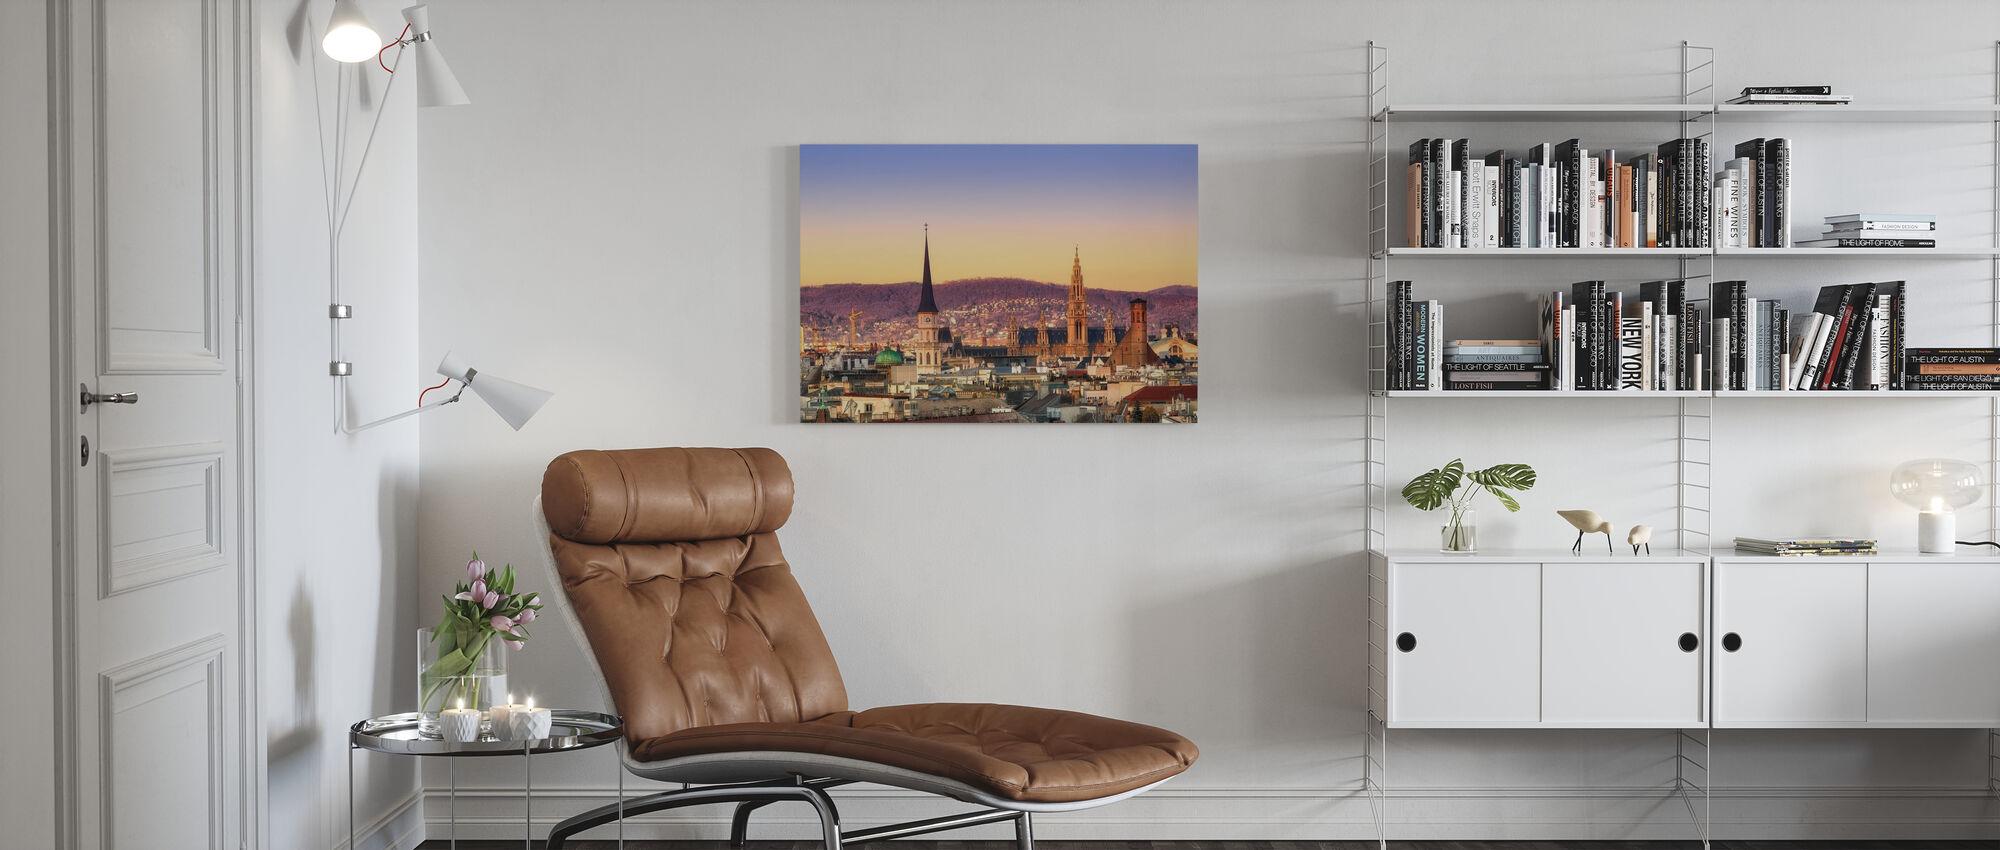 Wien Sonnenaufgang - Leinwandbild - Wohnzimmer